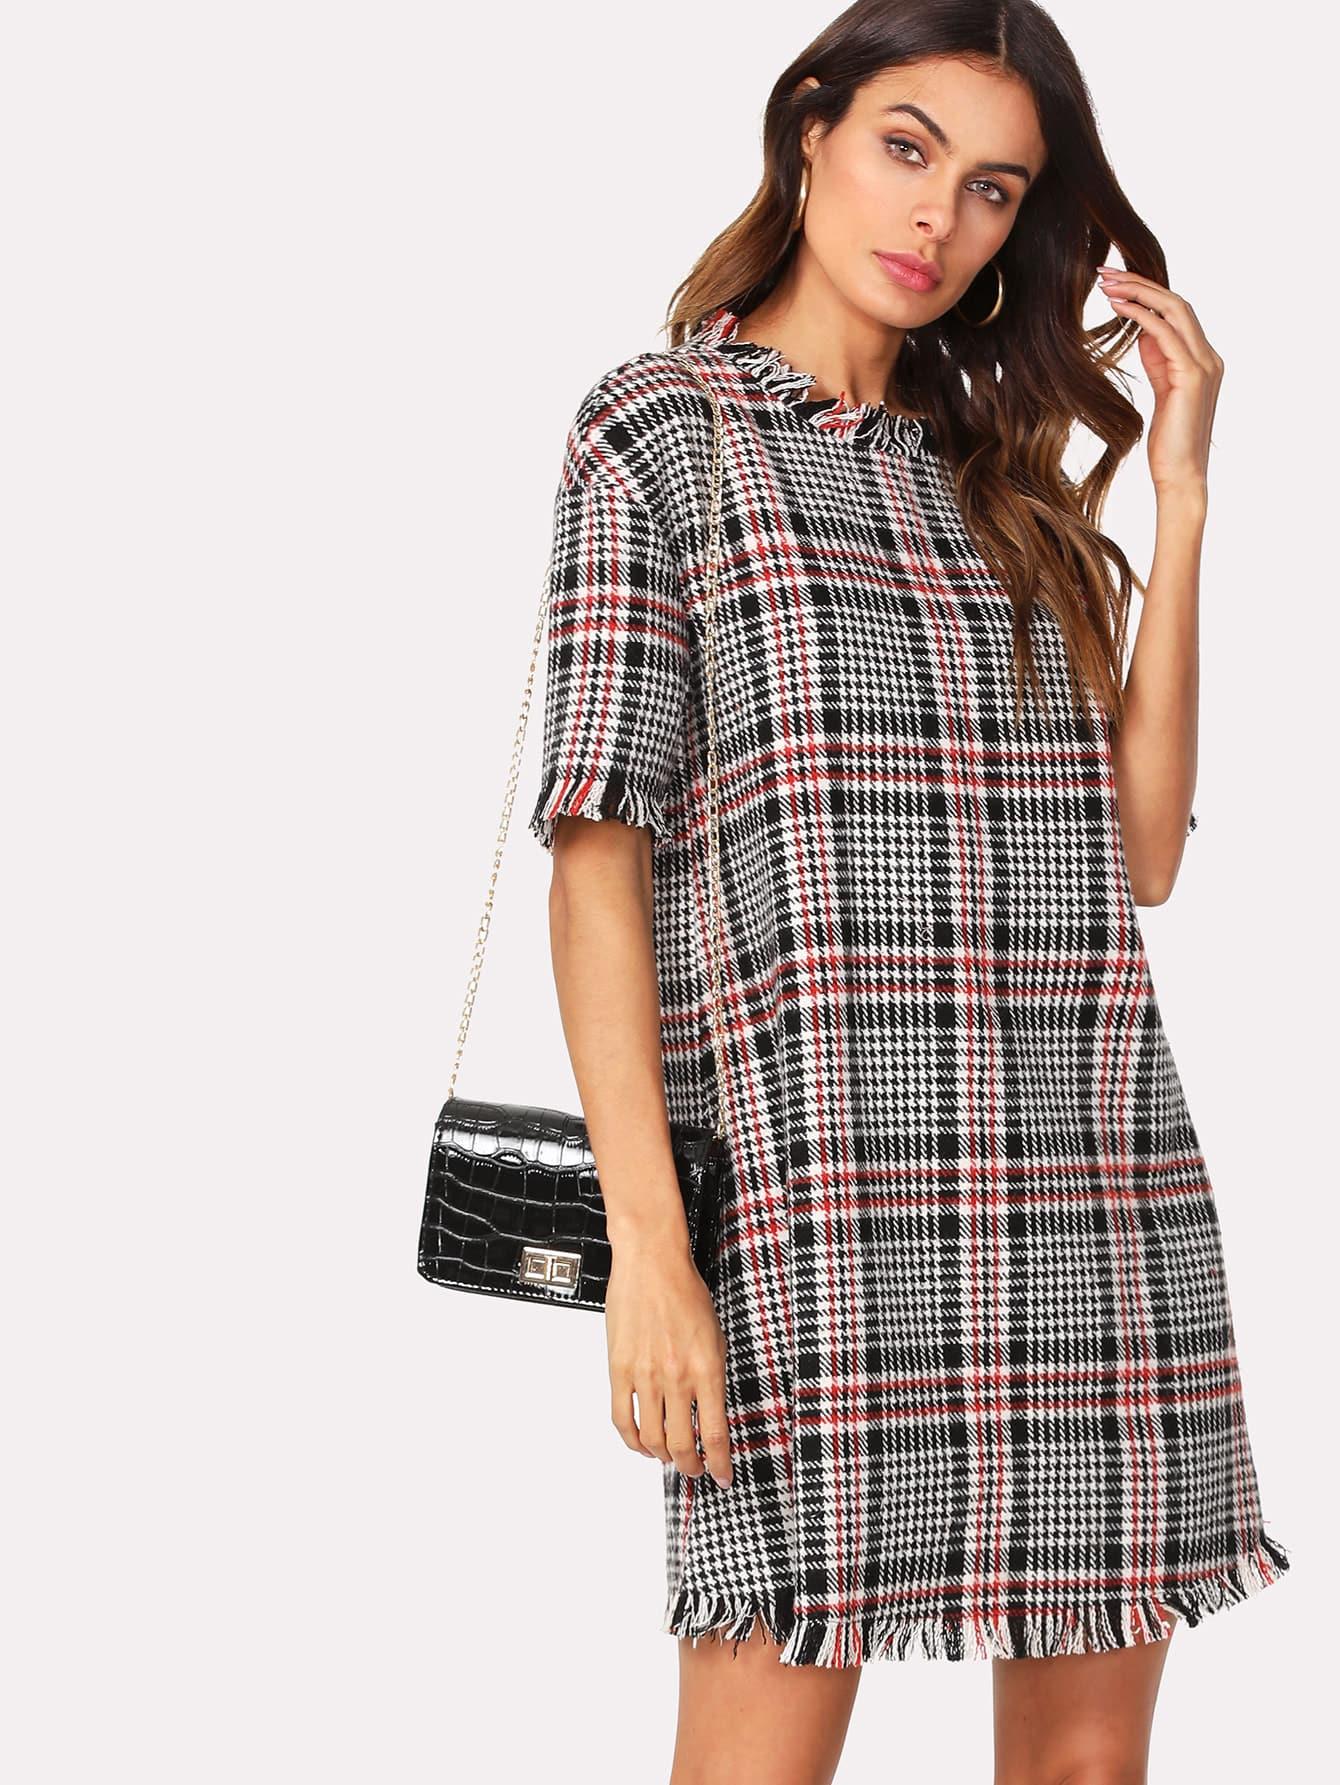 Frayed Trim Houndstooth Tweed Dress rhinestone detail frayed edge tweed skirt